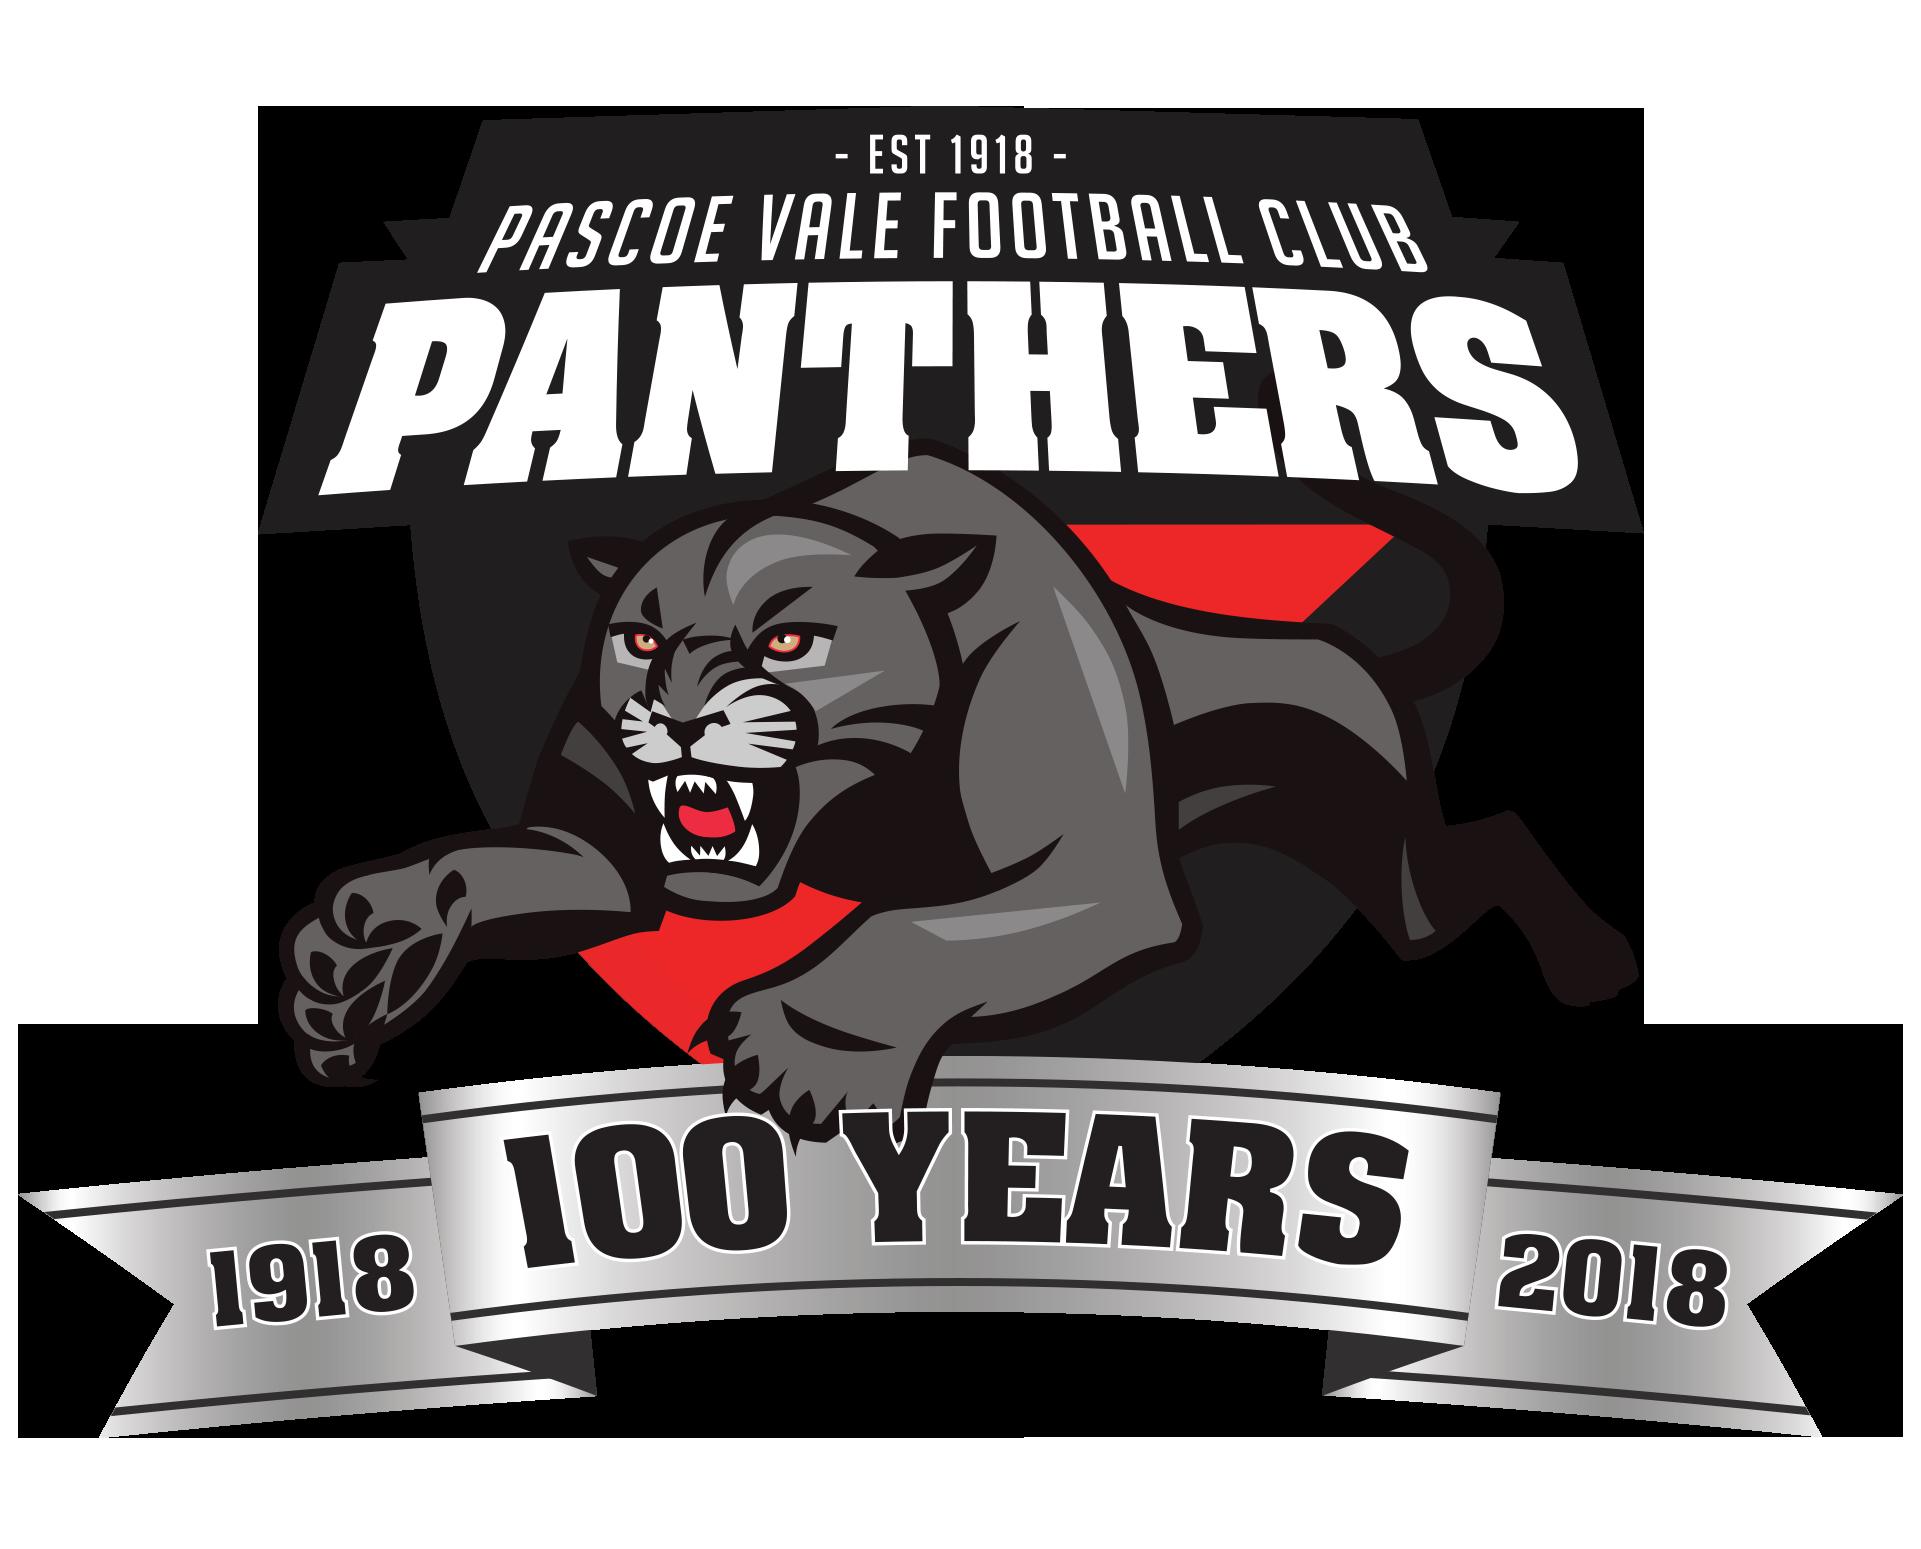 PVFC 100 YEAR LOGO FINAL.png